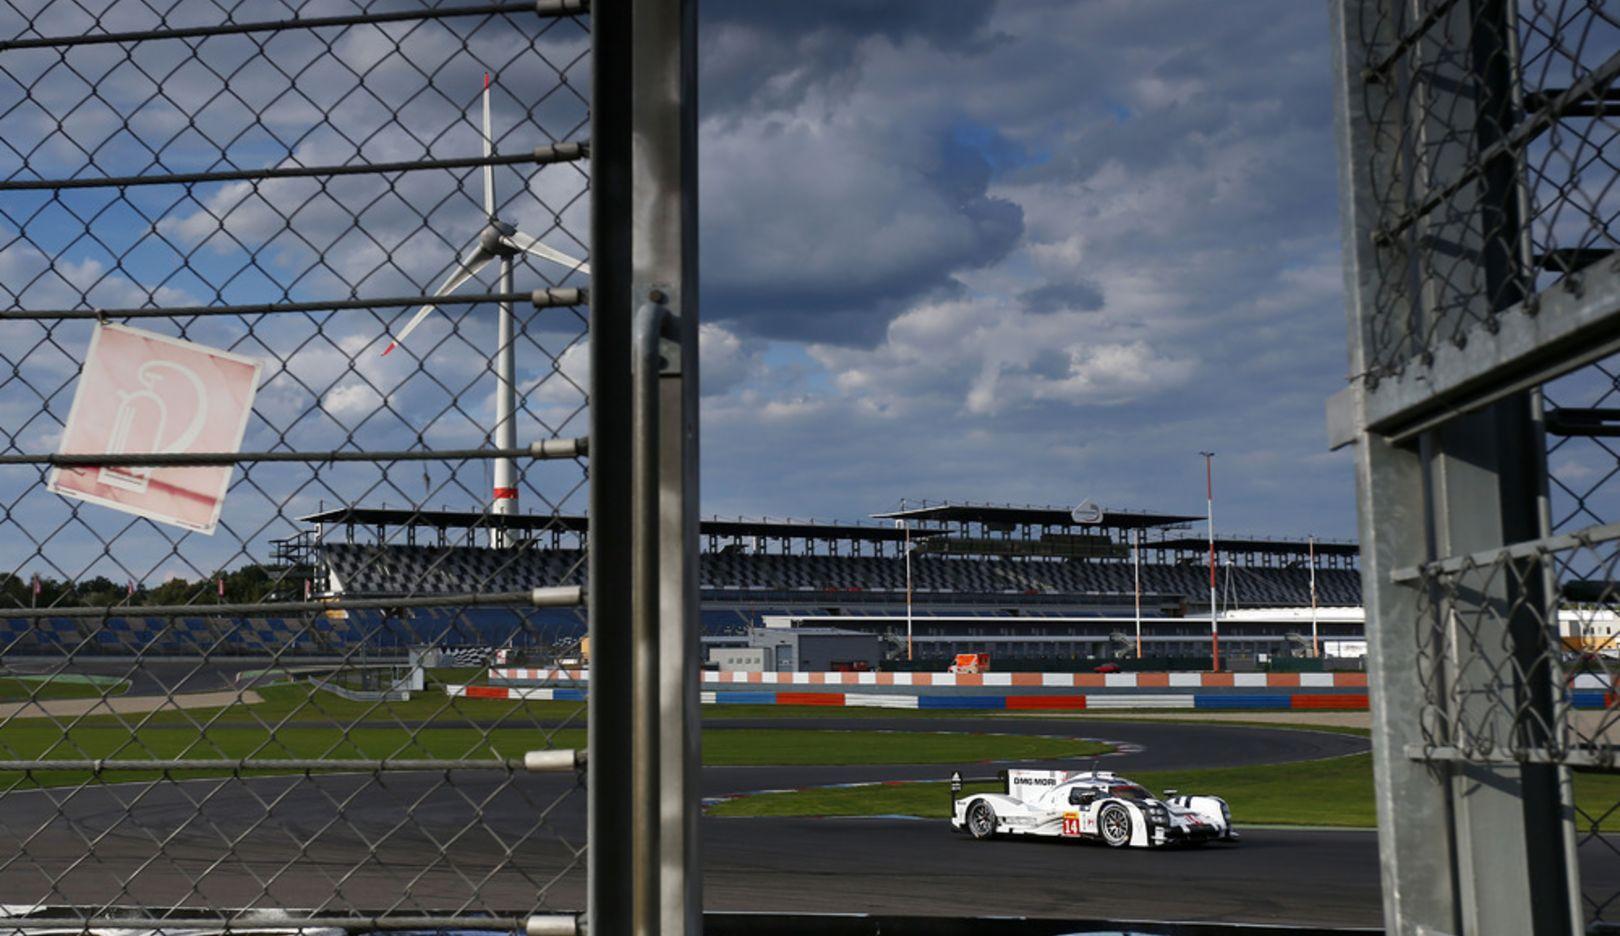 LMP1 Test, Eurospeedway, Lausitzring, 2014, Porsche AG